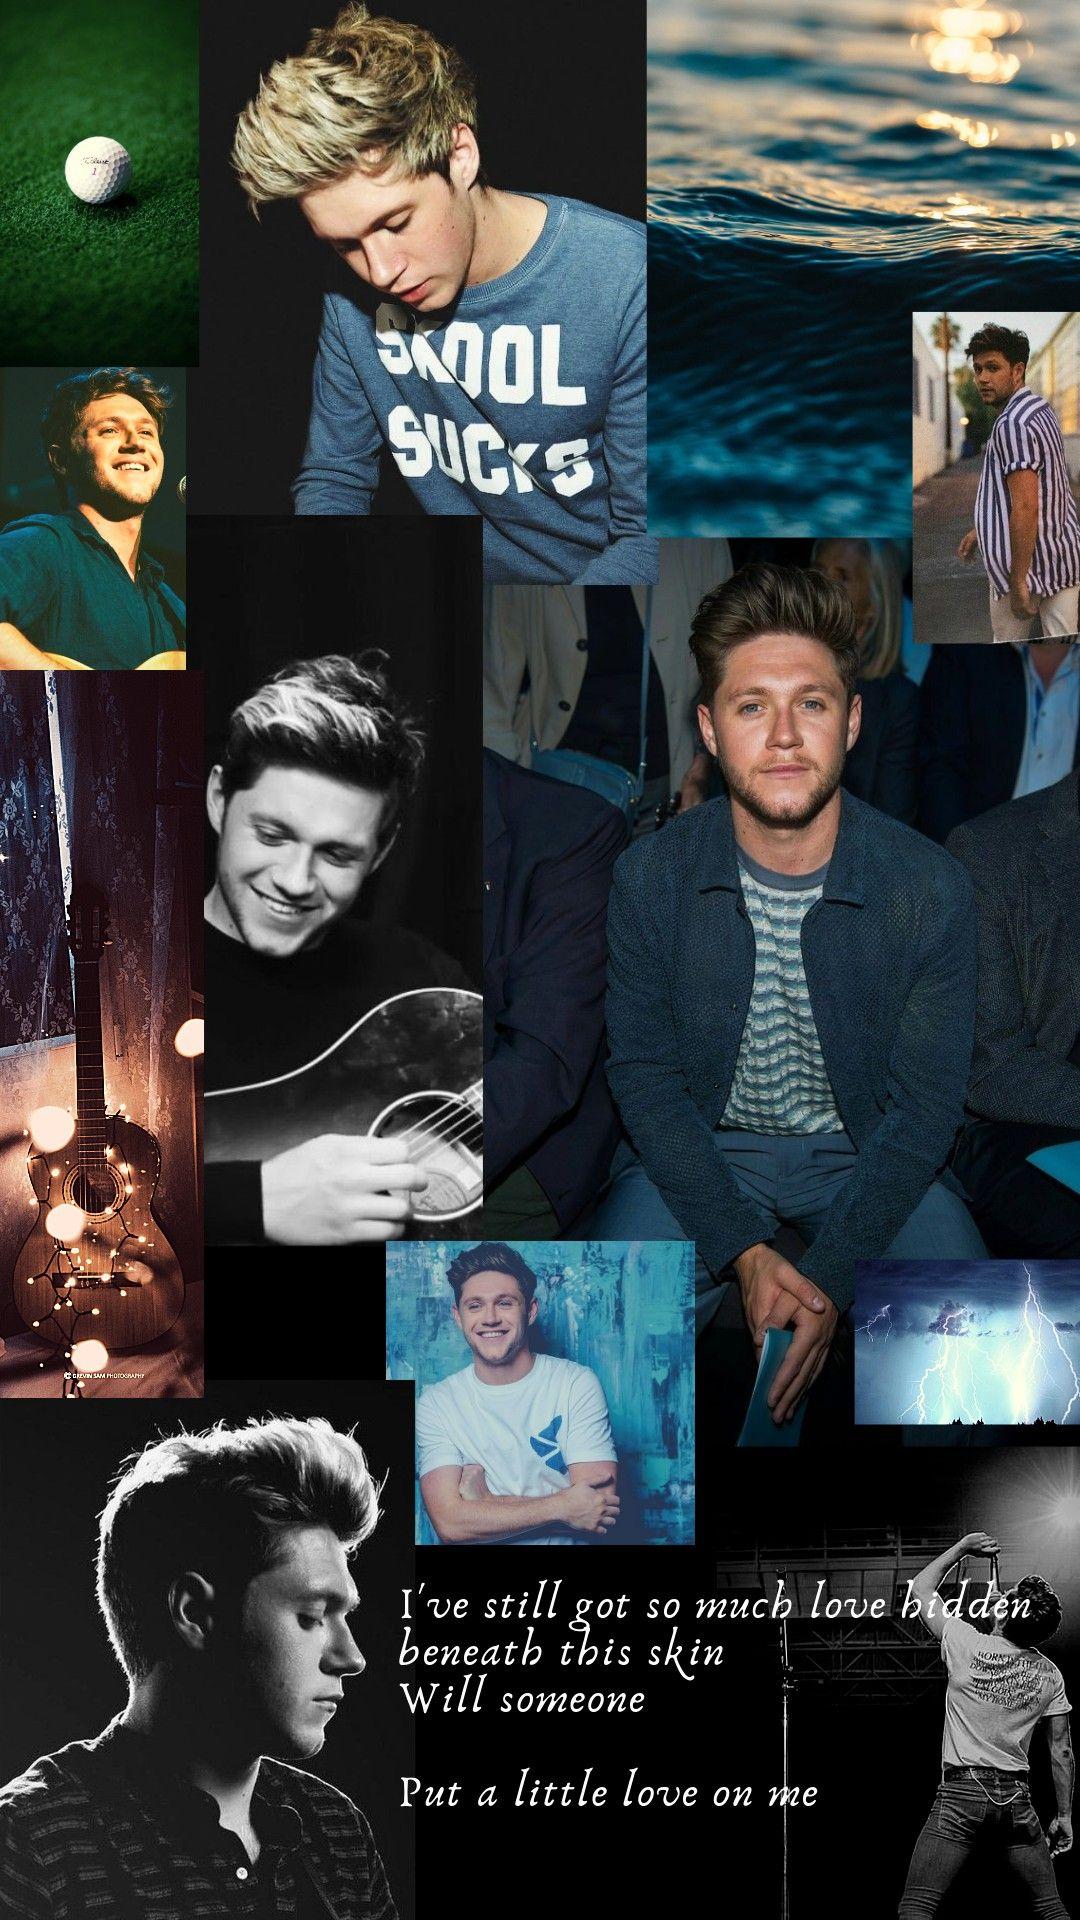 Niall Horan - Put A Little Love On Me from Heartbreak Weather album